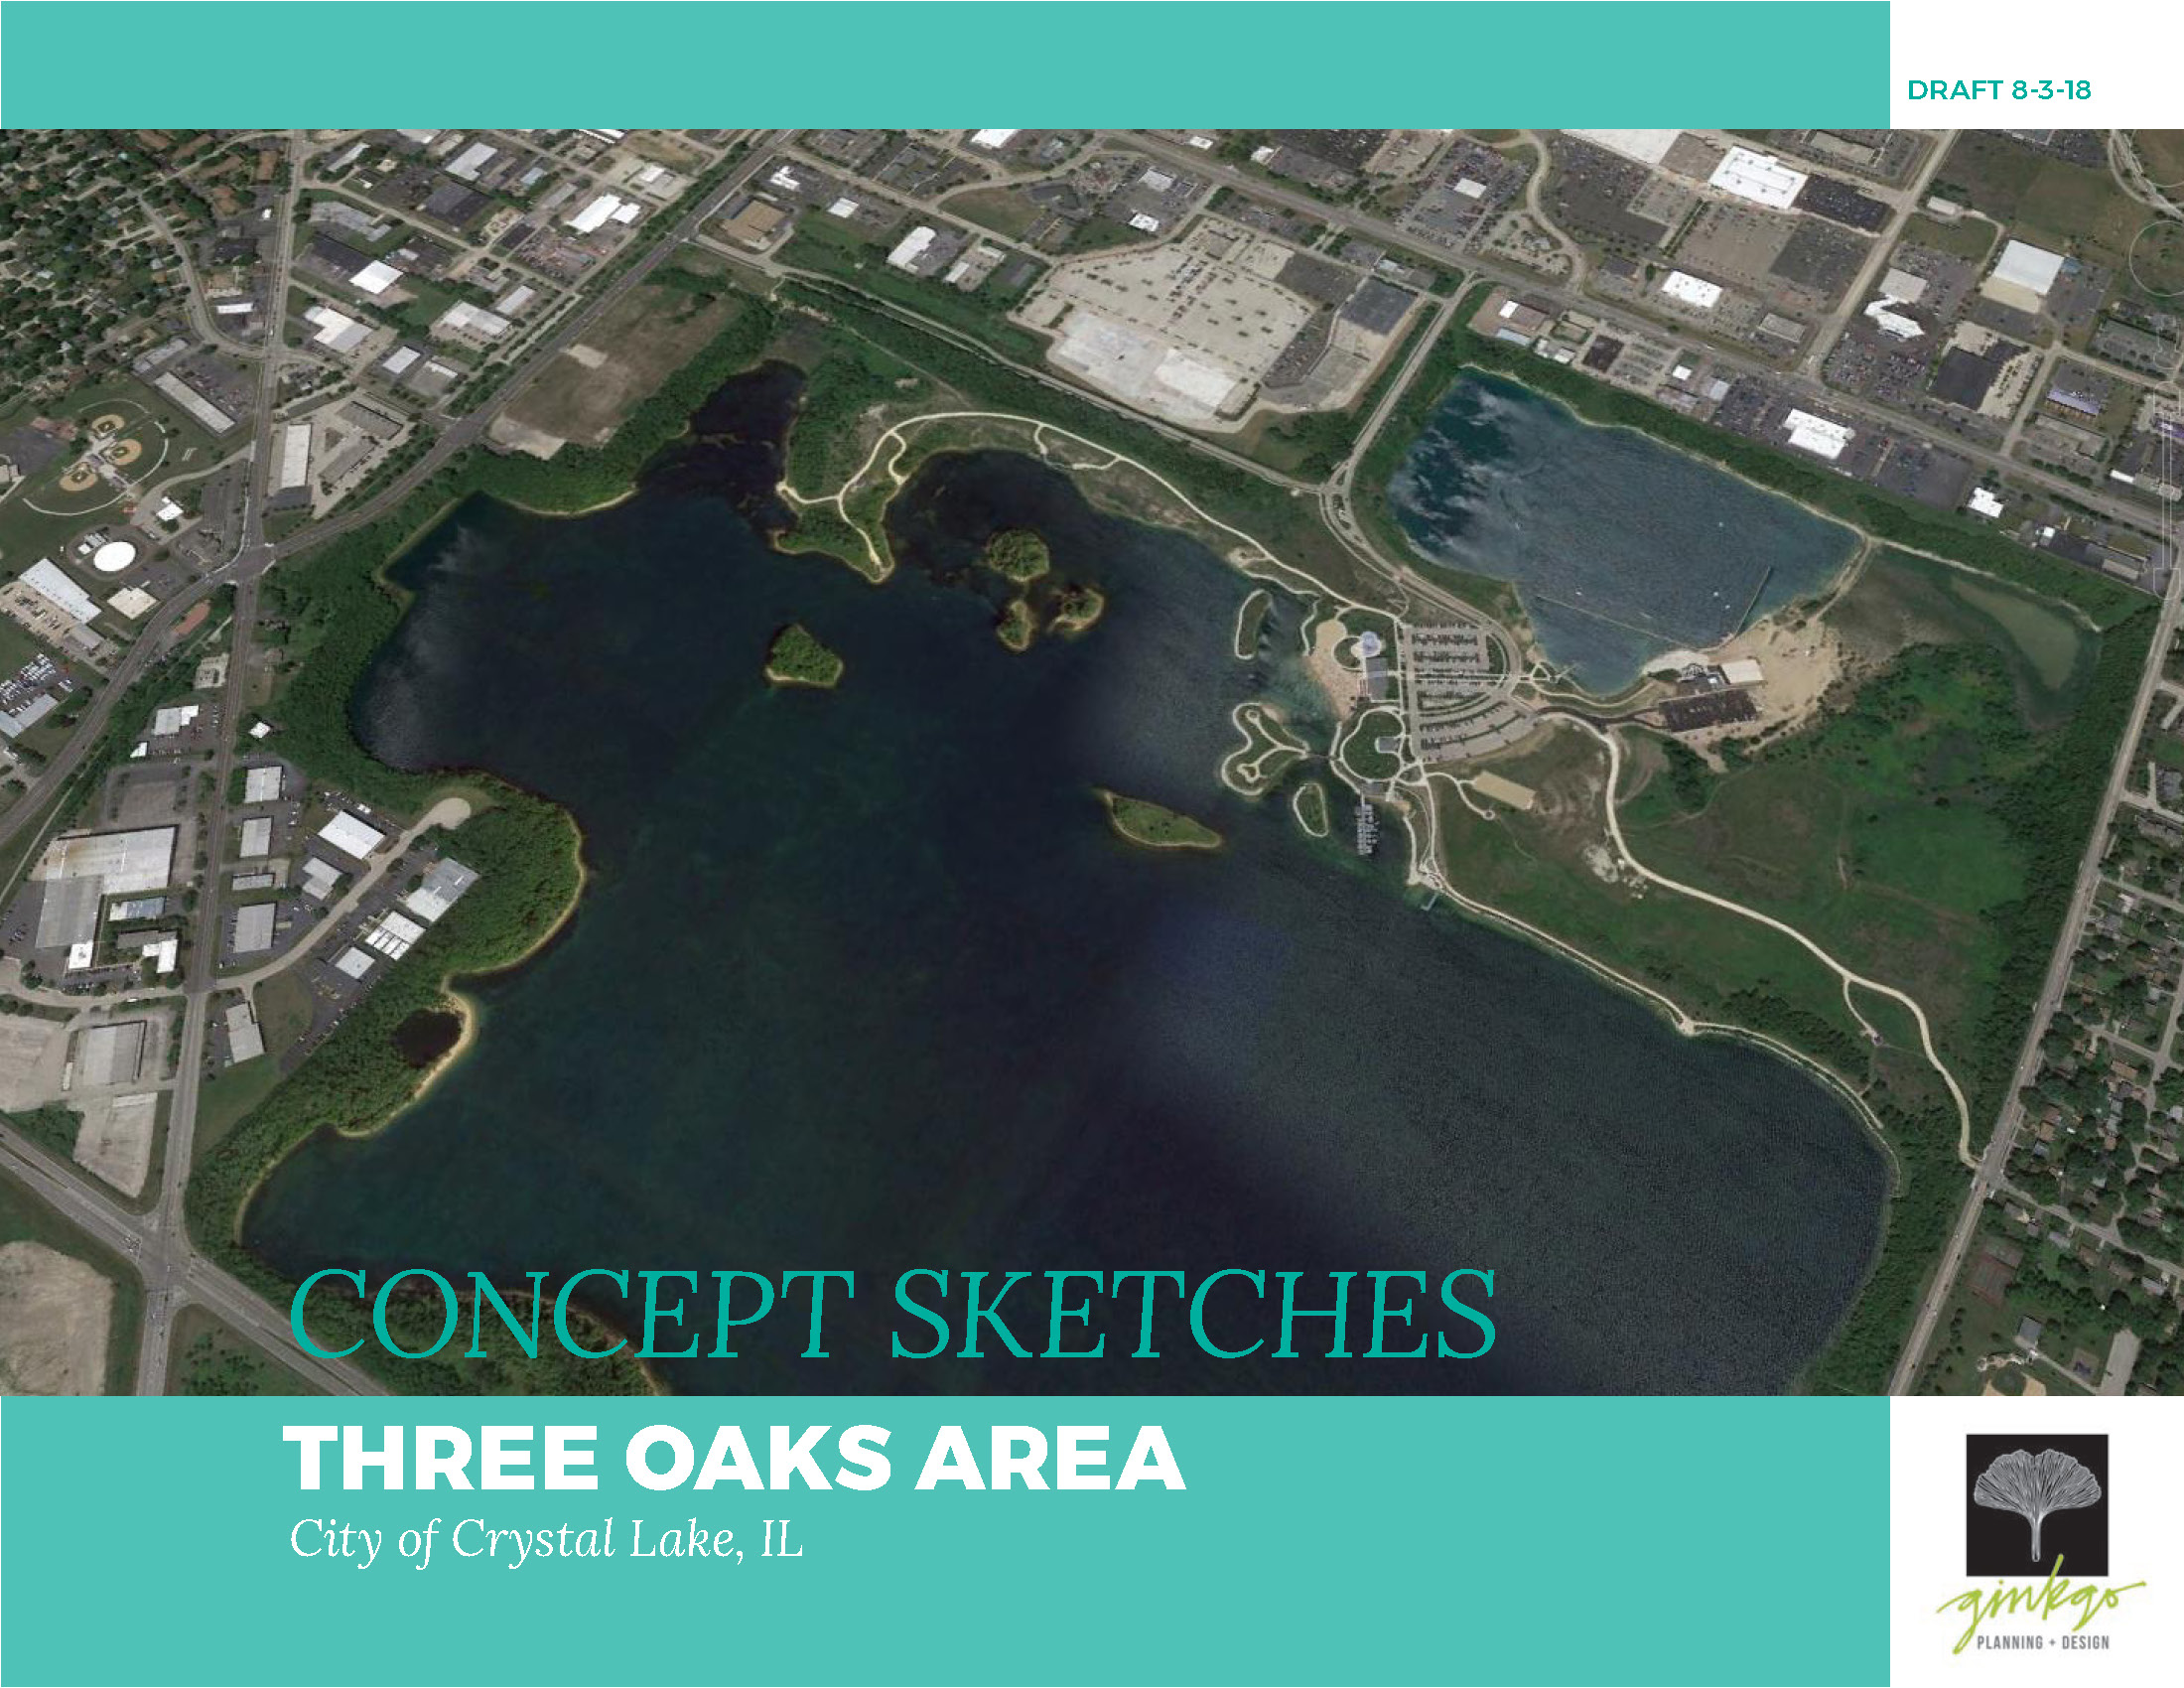 THREE OAKS CONECPT SKETCHES 8-3-18 1.jpg